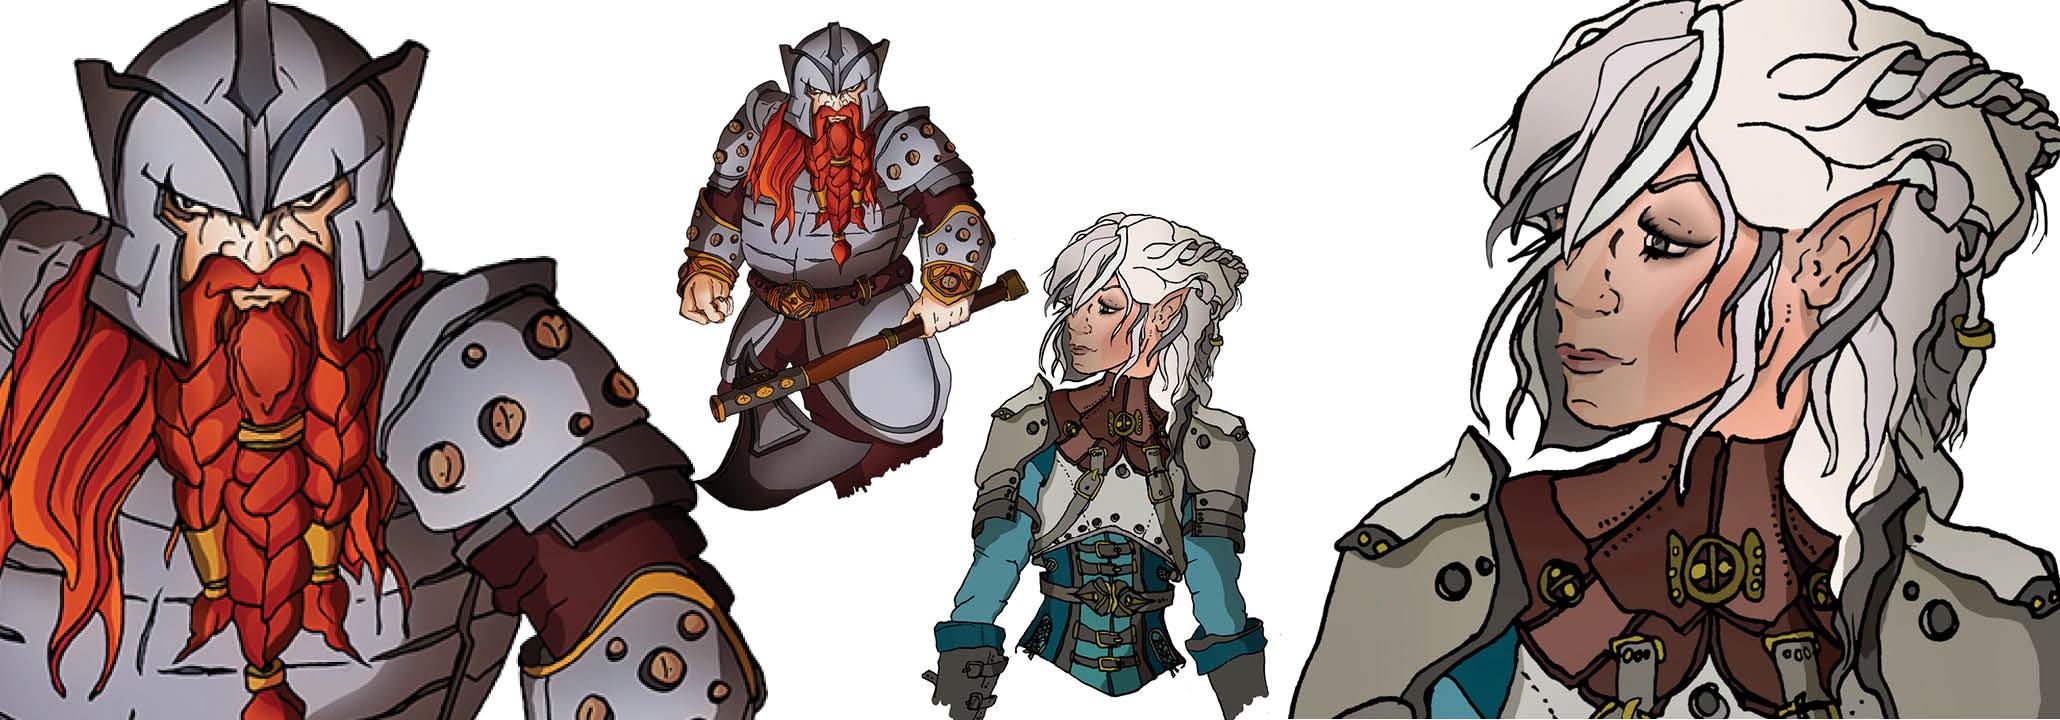 Fantasy character profile artwork